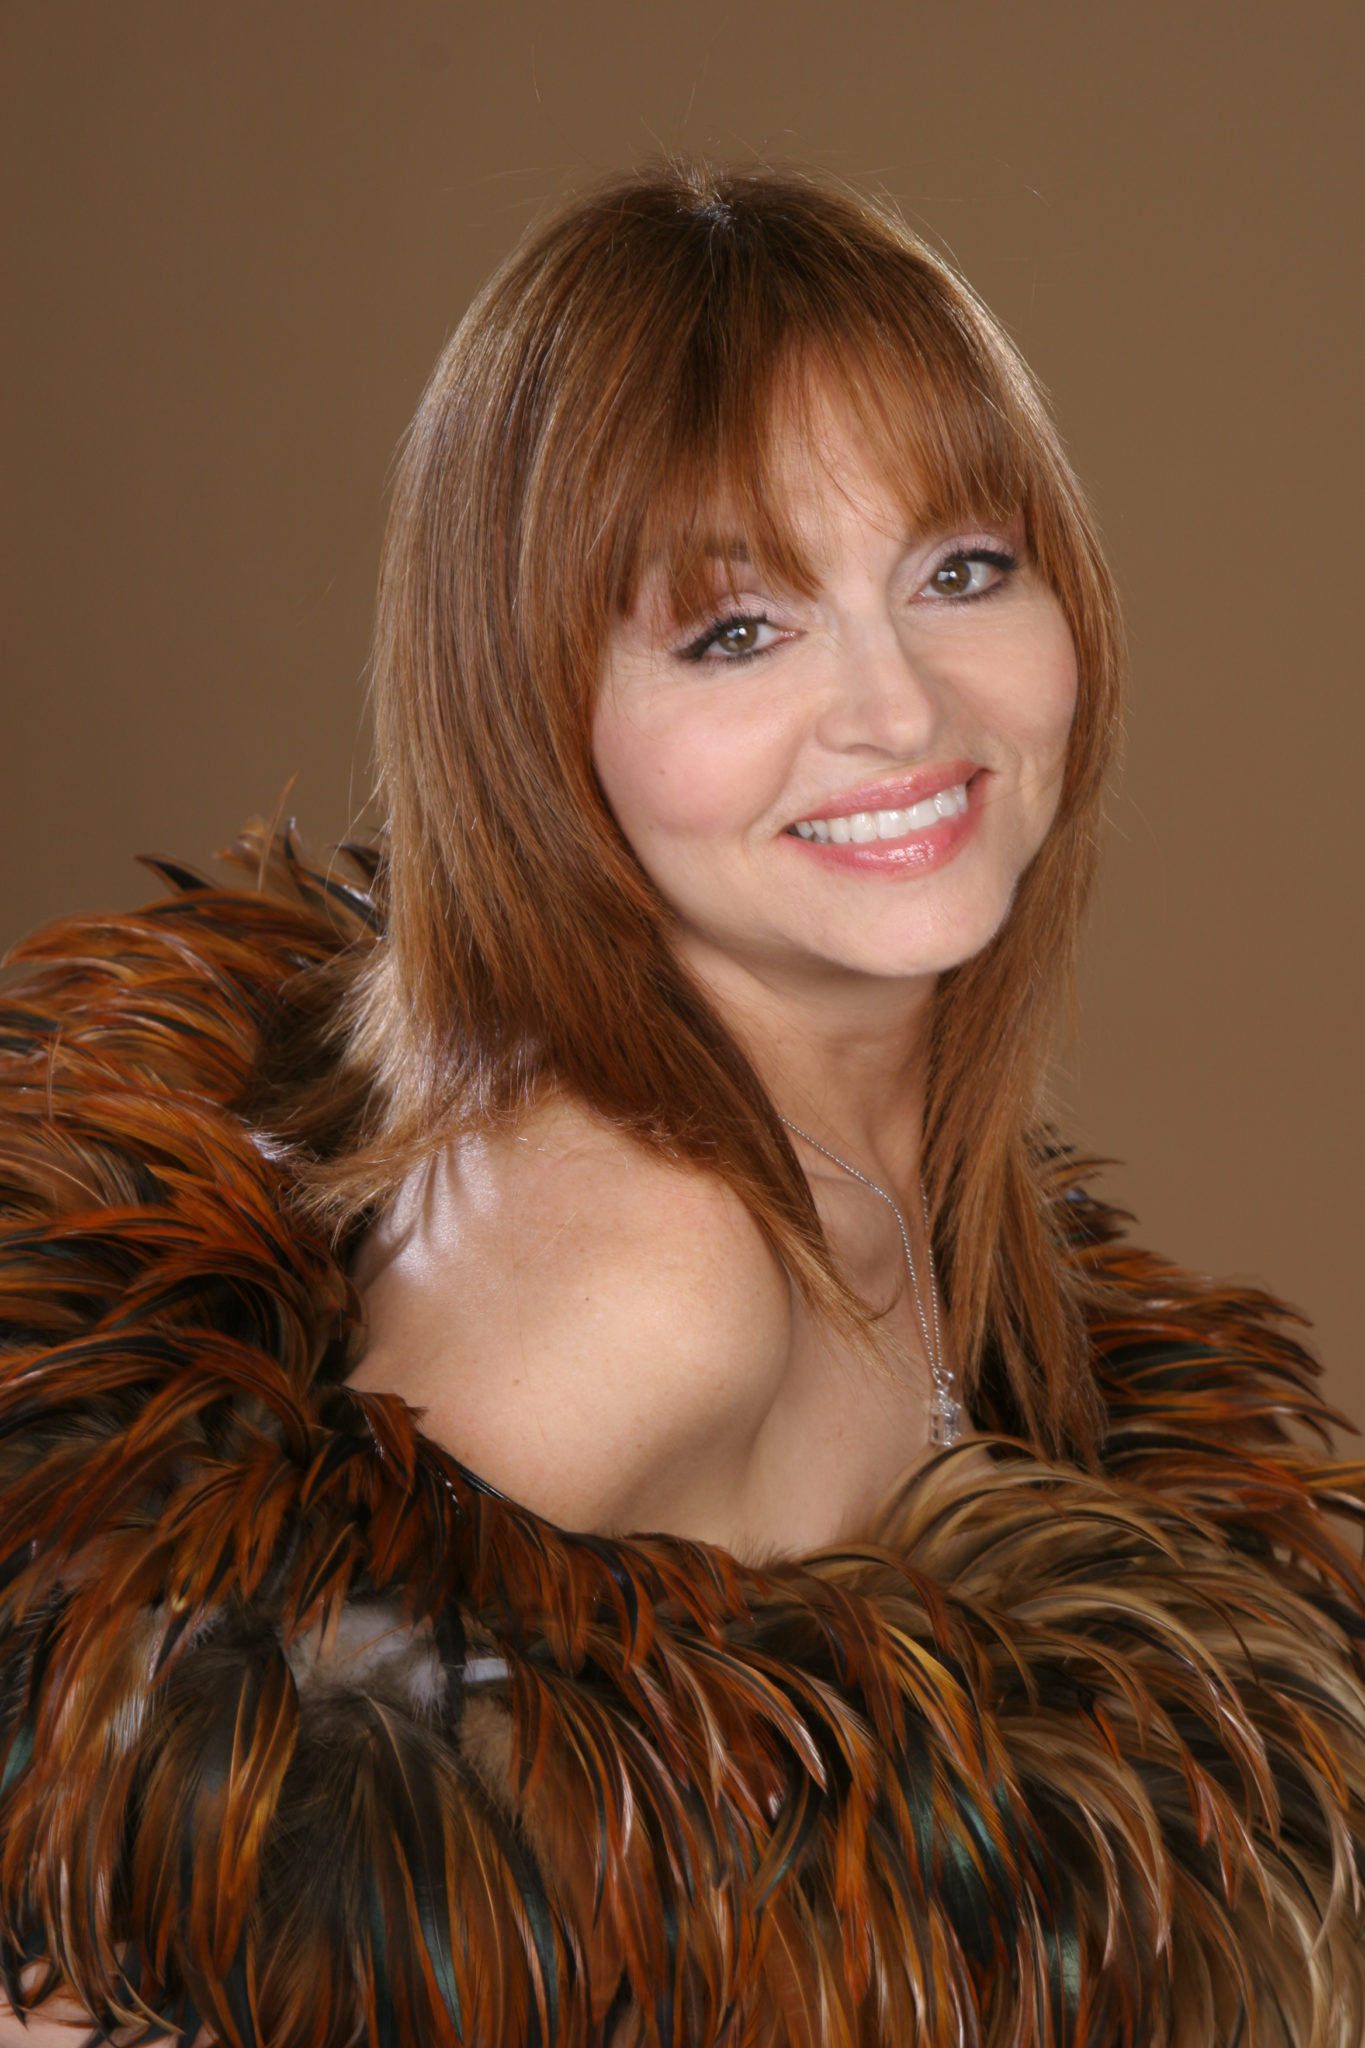 Judy Tenuta S Photo Gallery Official Website Of Comedian